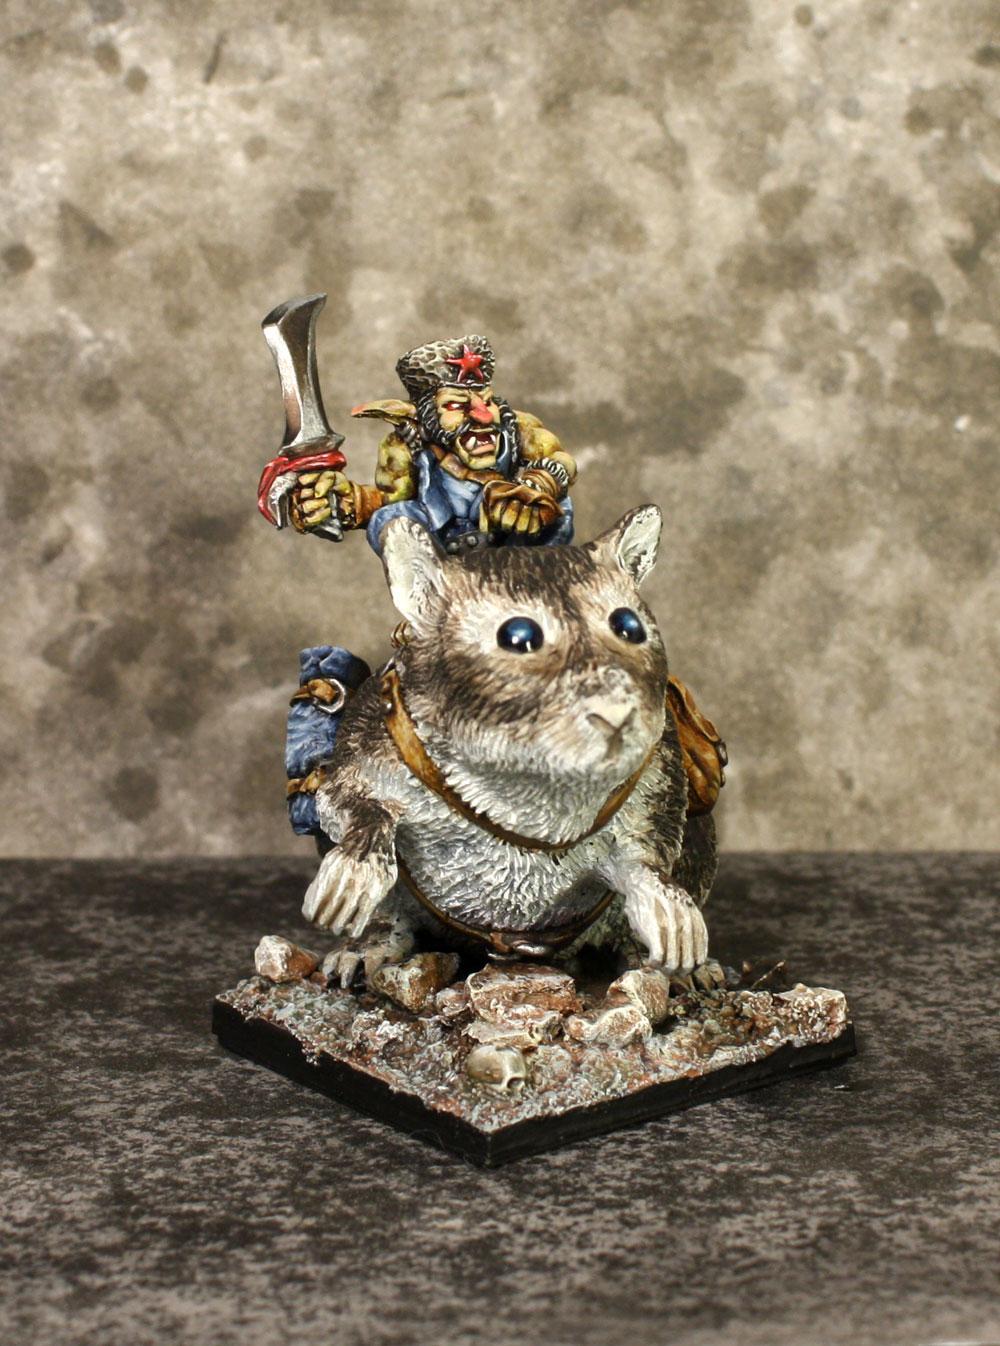 Des gobelins poilus ! - Page 2 Hamster_Fury_001